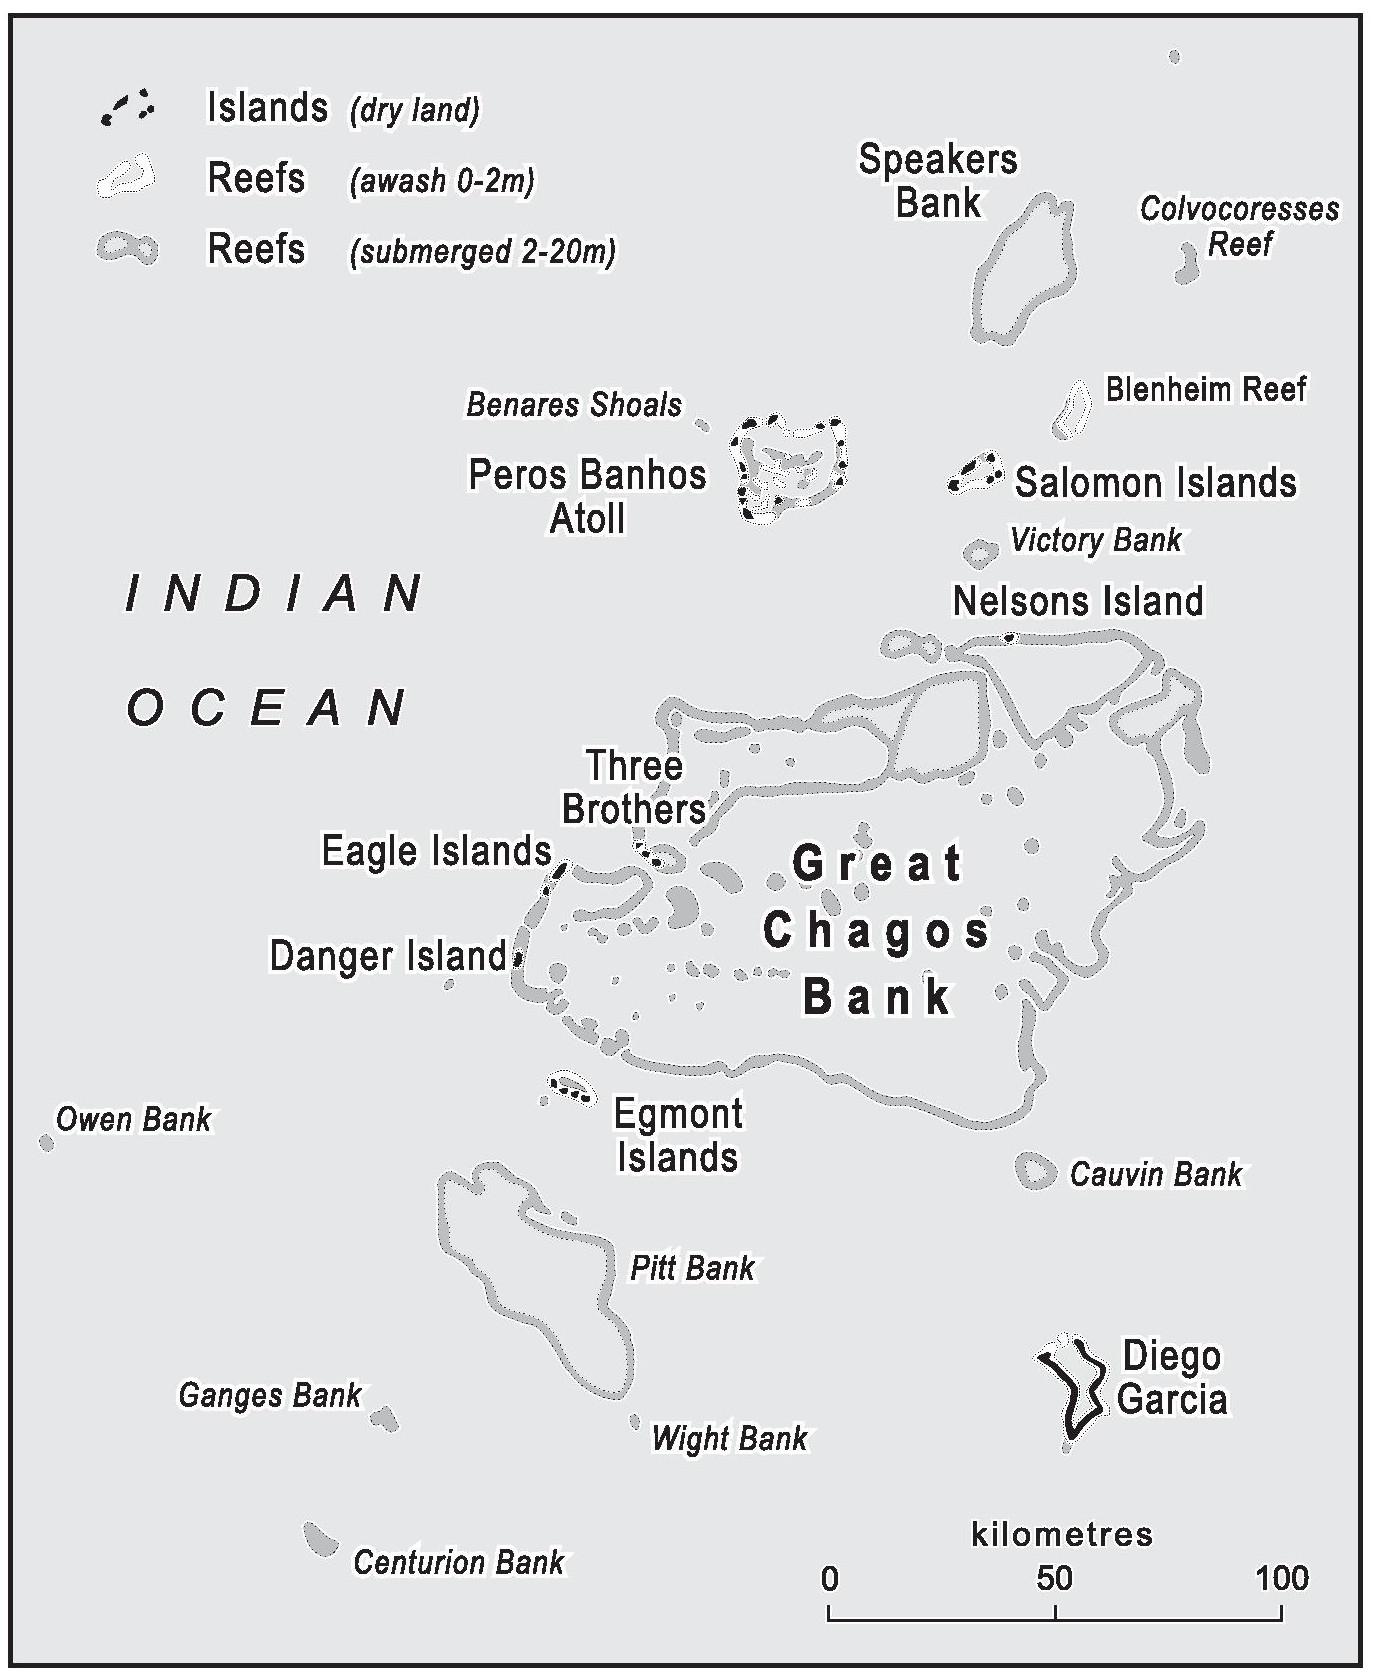 Map of the Chagos Archipelago